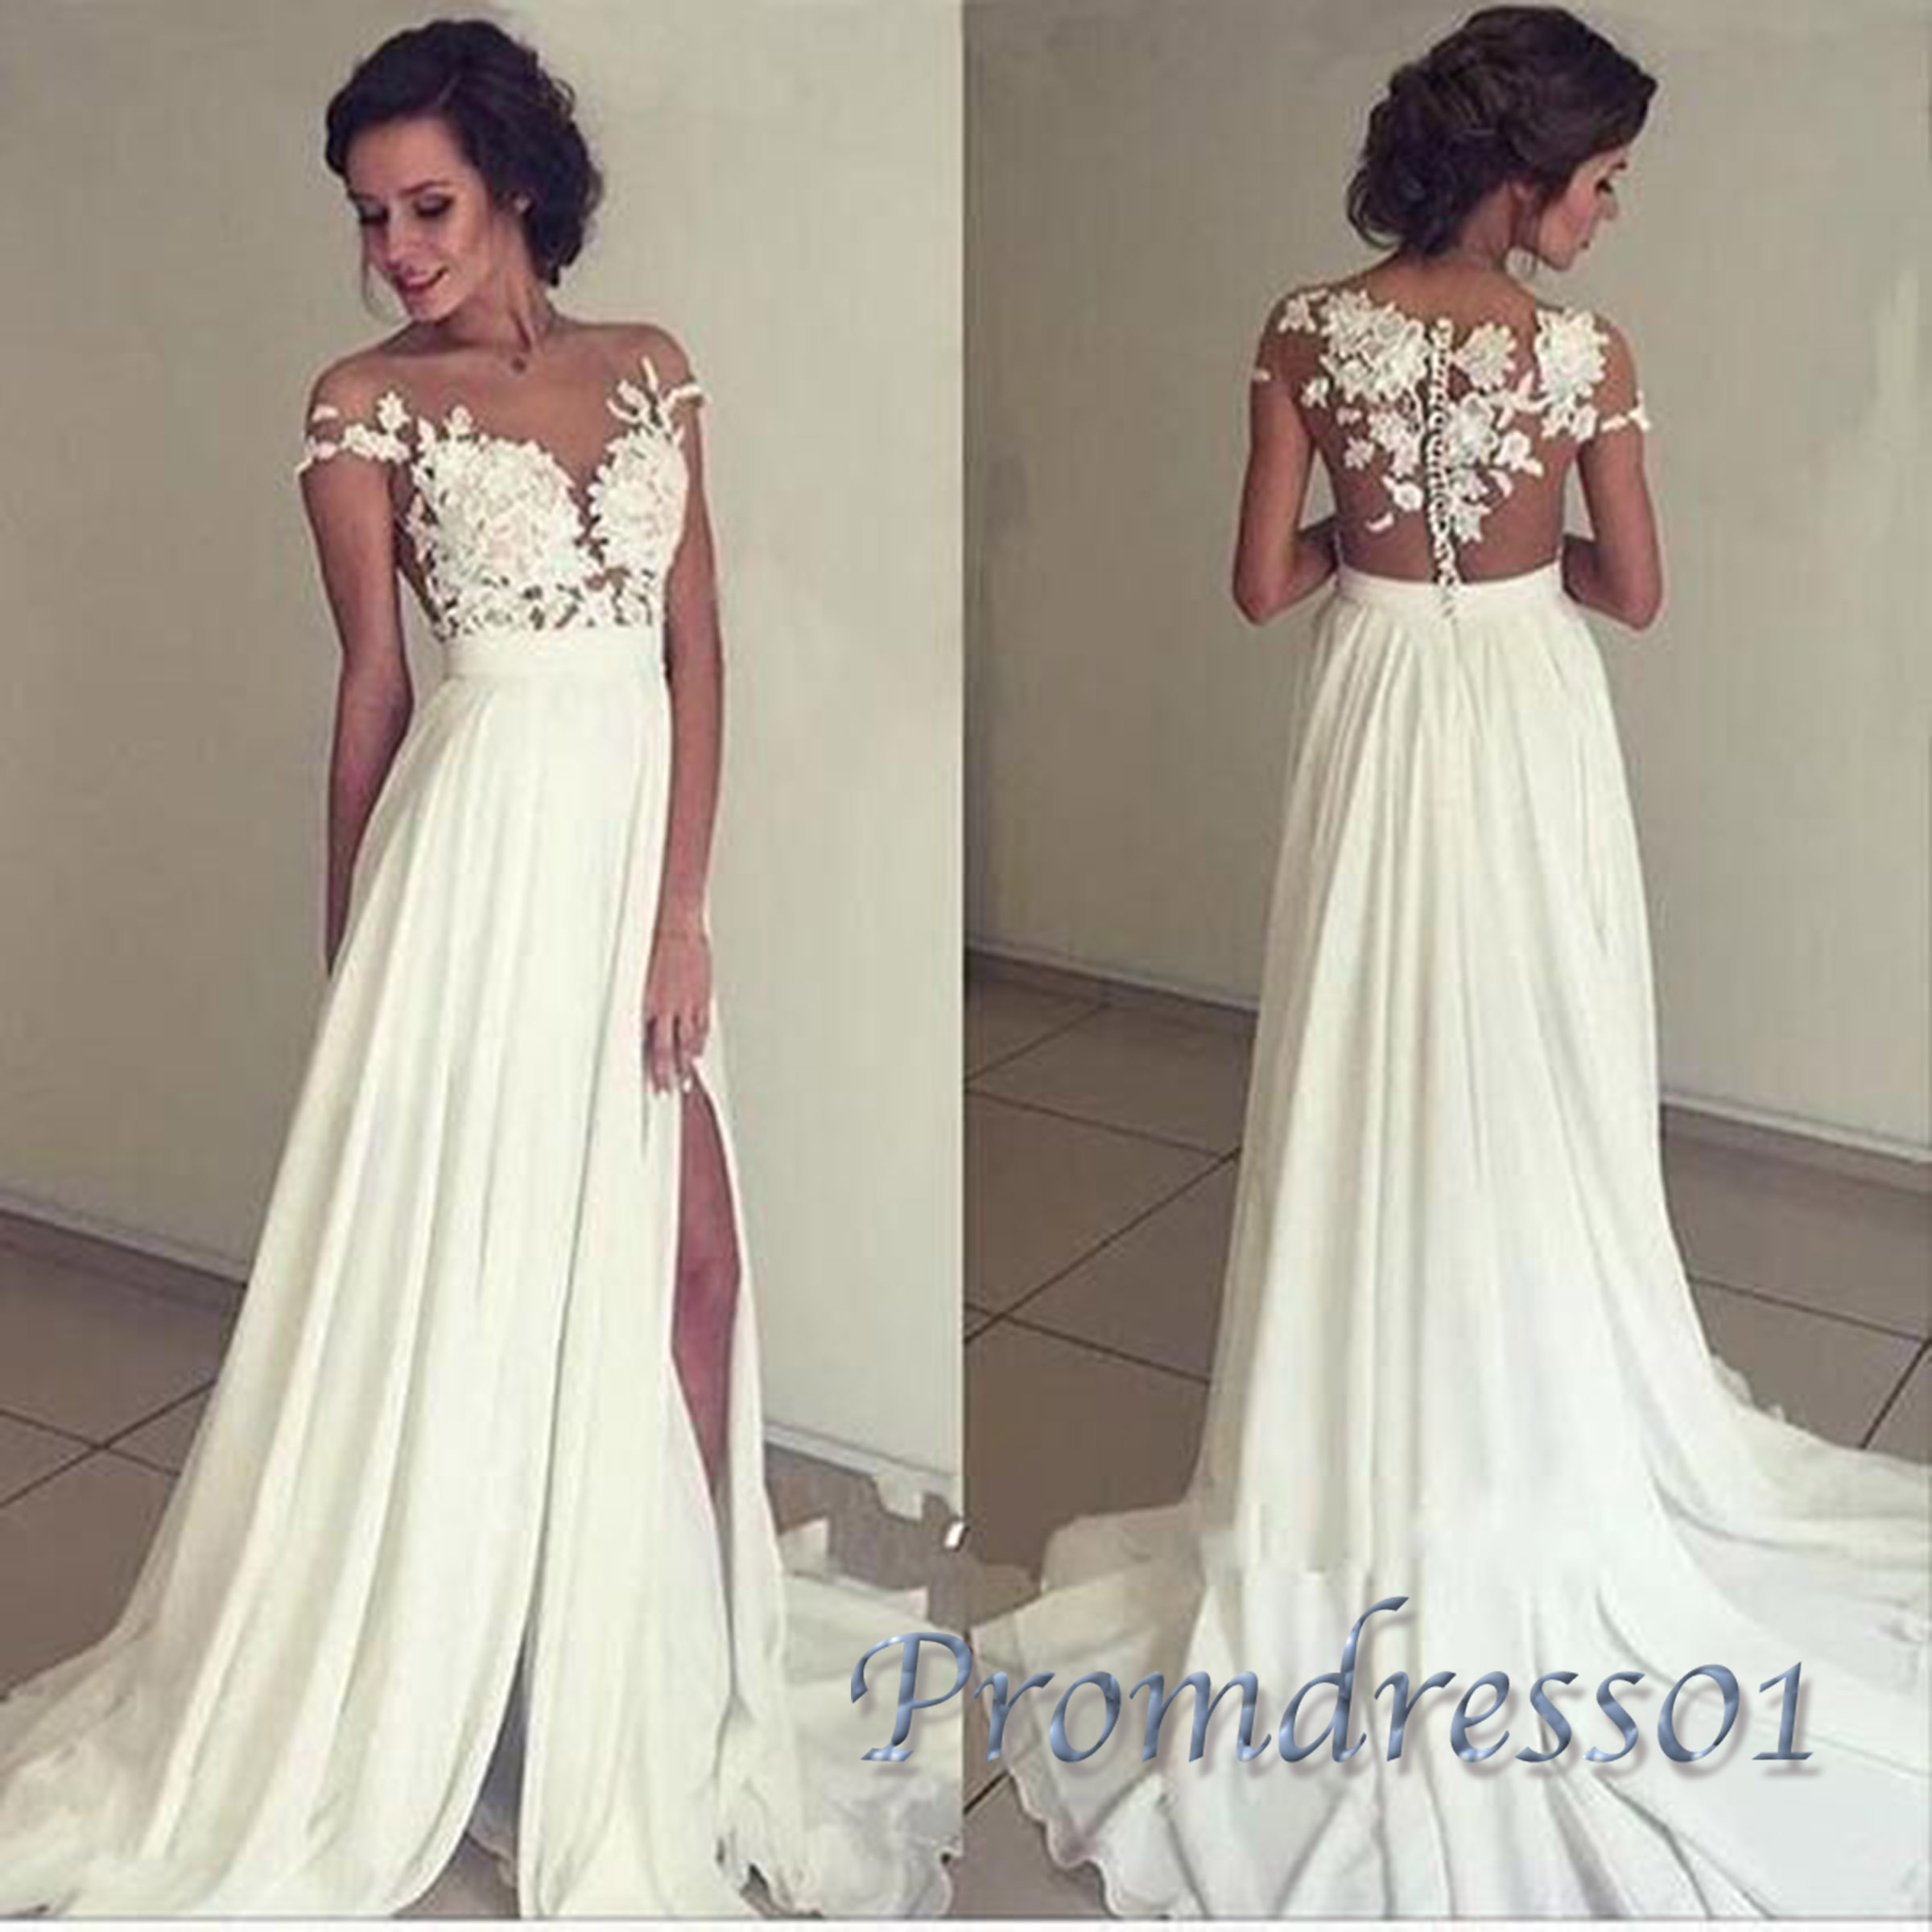 Prom Dresses 2017 by Promdress01.com